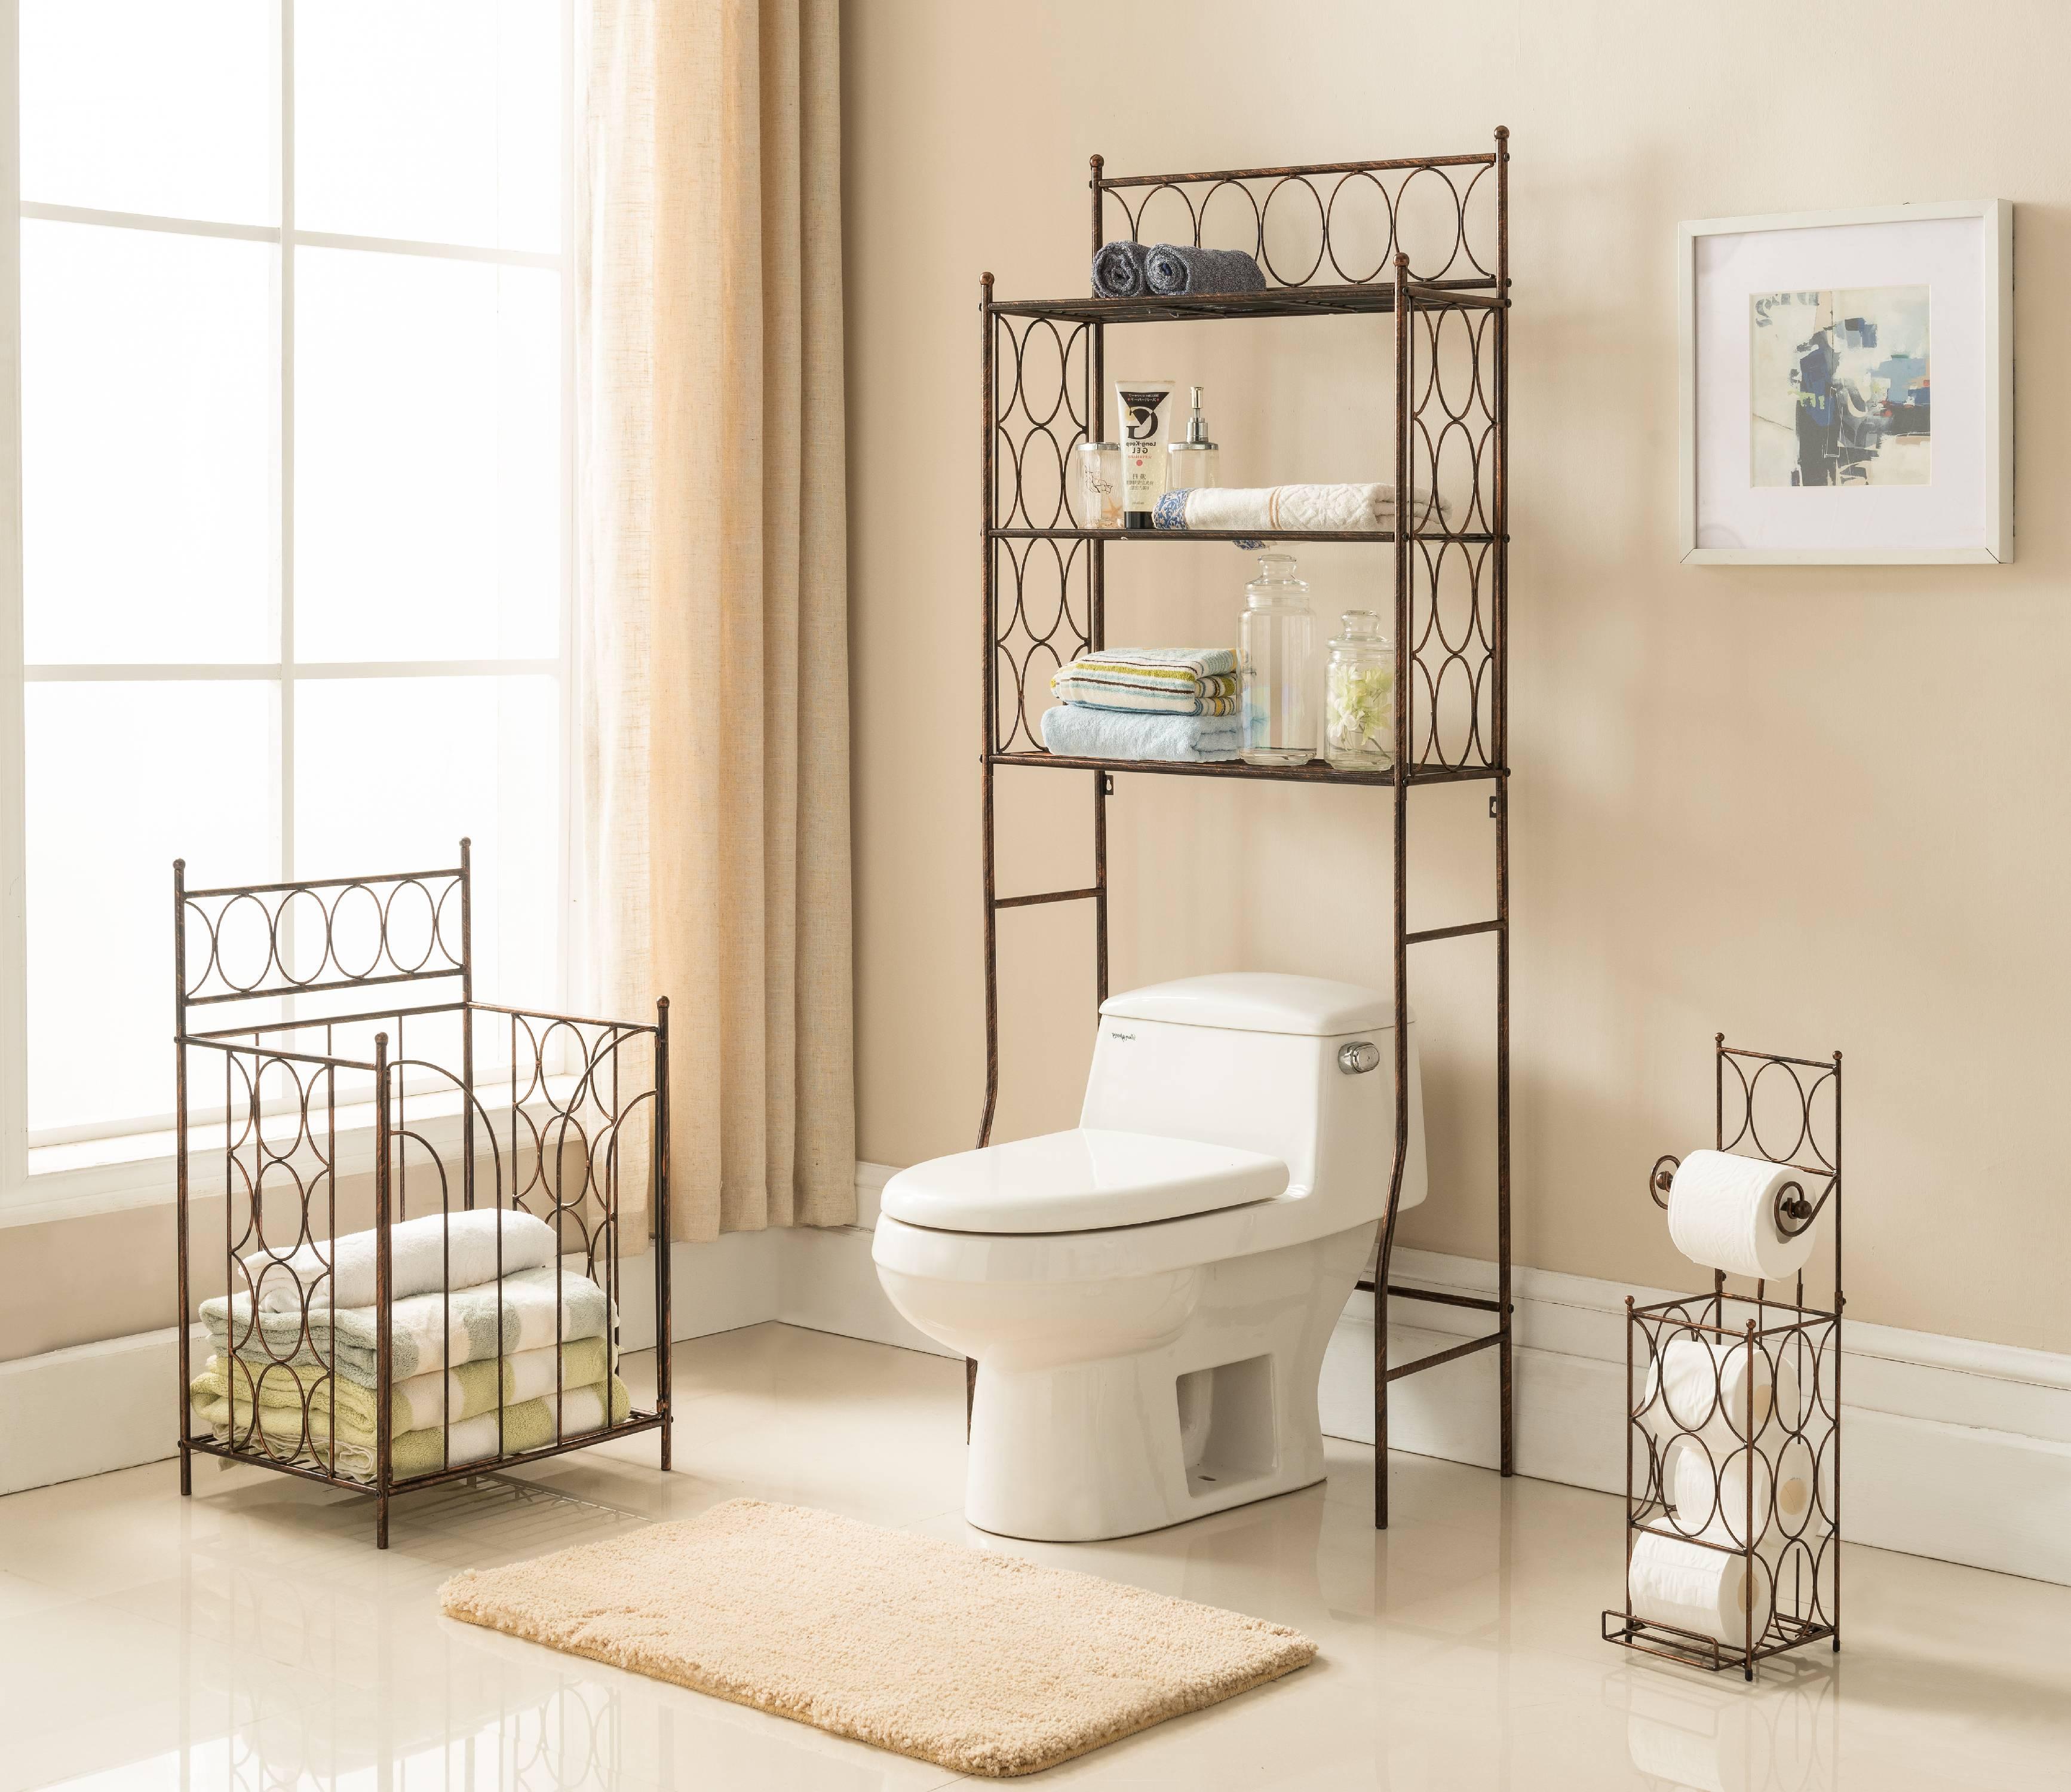 3 Piece Copper Iron Bathroom 3 Tier Shelf Storage, Toilet Paper Holder U0026  Towel Rack Stand Organizer Display Set